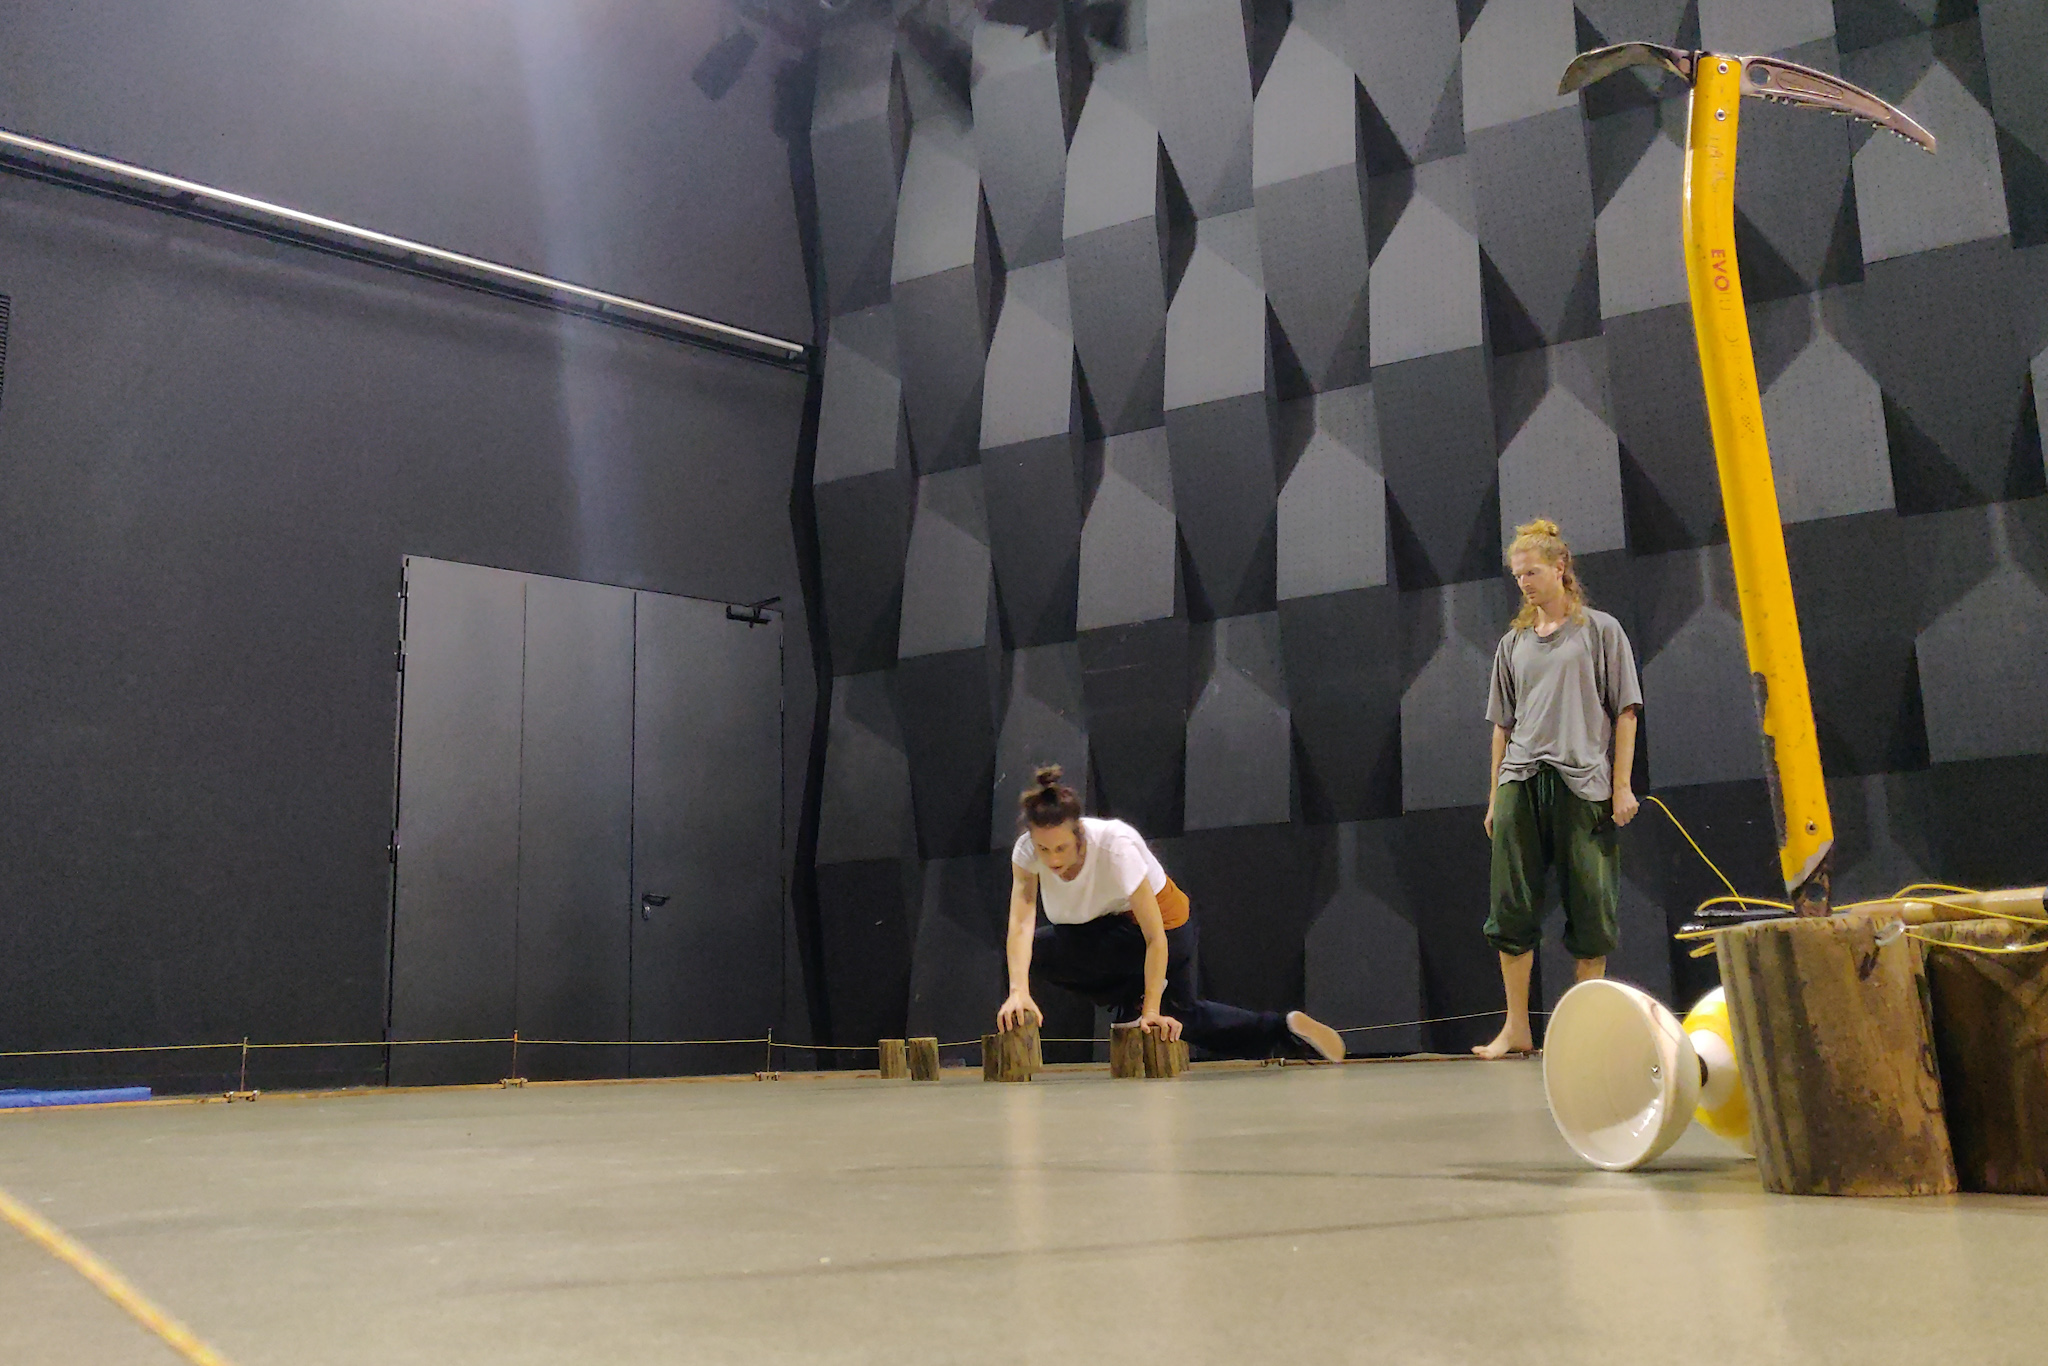 Dame du Cirque En Fabricació #3 a La central del Circ | Blog | troposfera.xyz by Dídac Gilabert